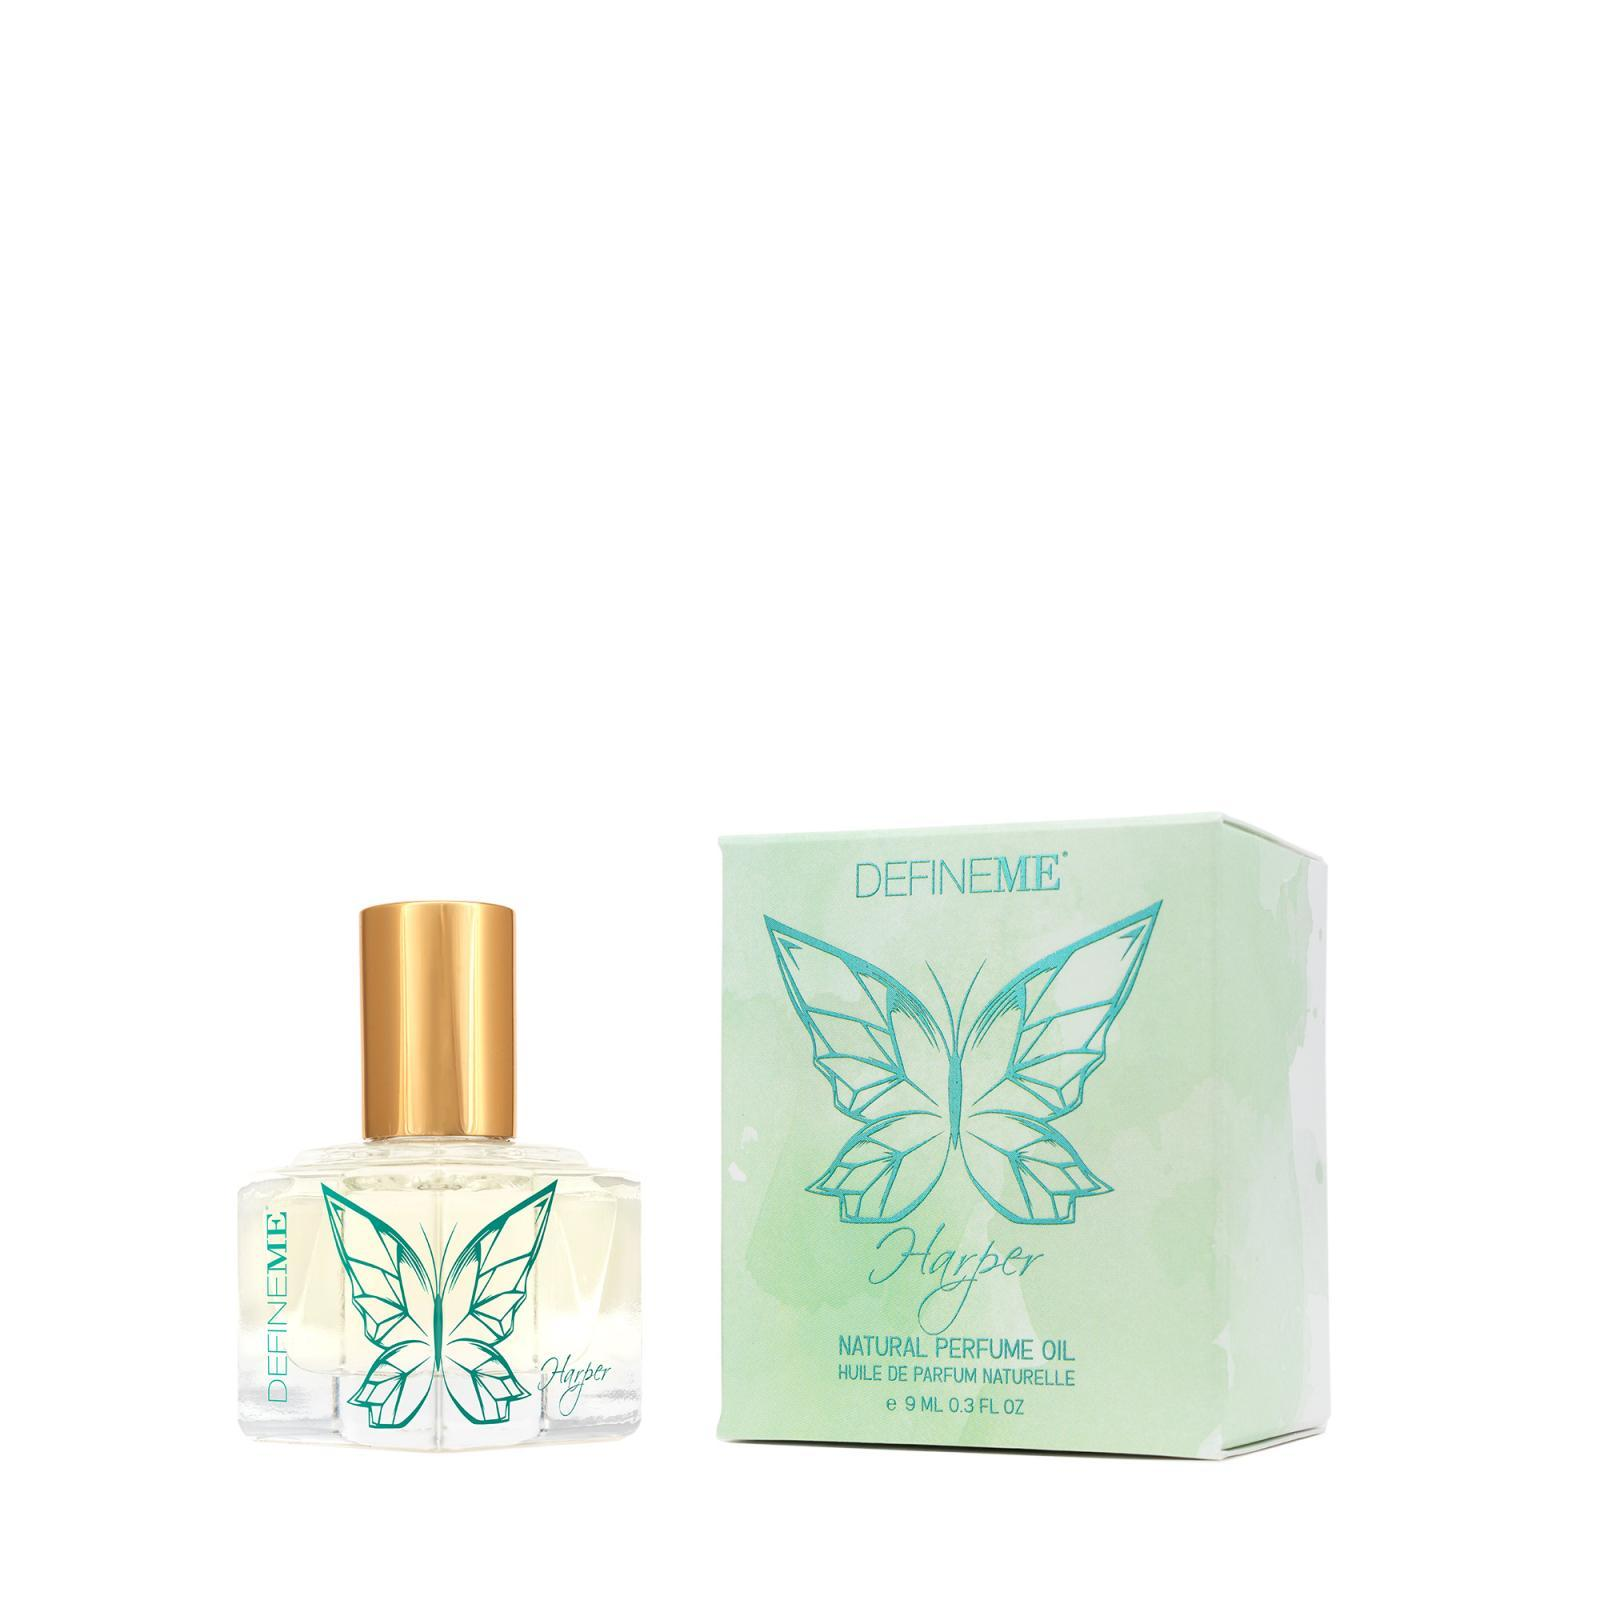 DEFINEME Harper Fragrance Oil